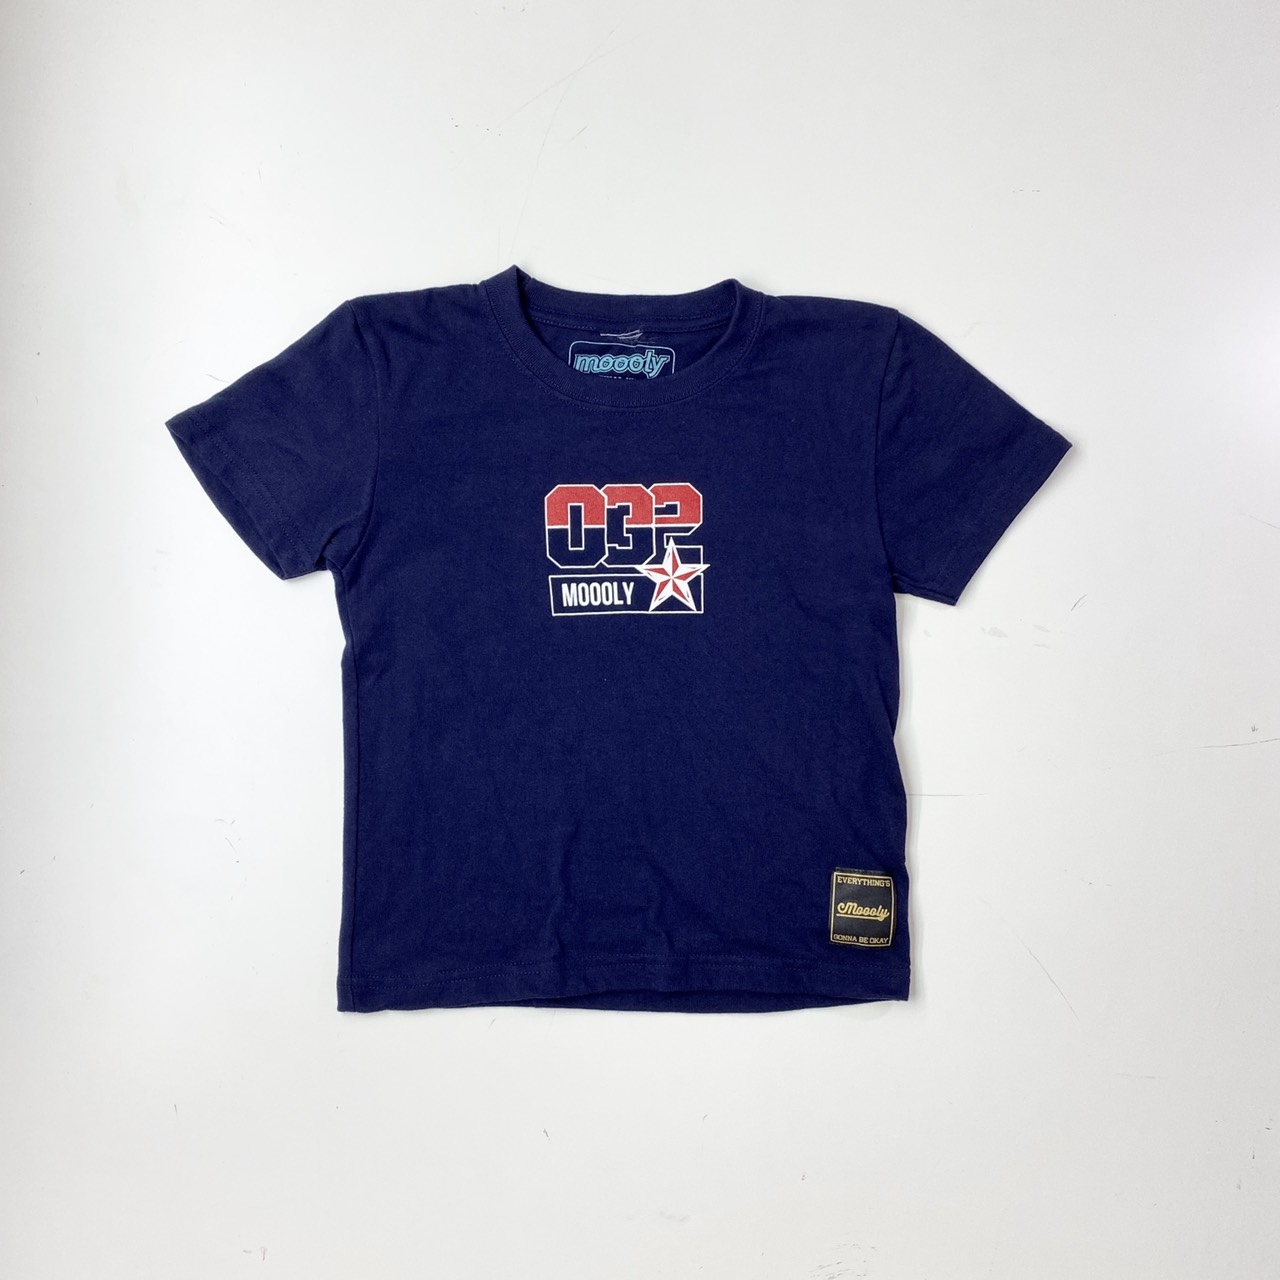 MLYBABYTS-2002-NVY / Moooly / モーリー / 山内 盛久 /ベイビー Tシャツ